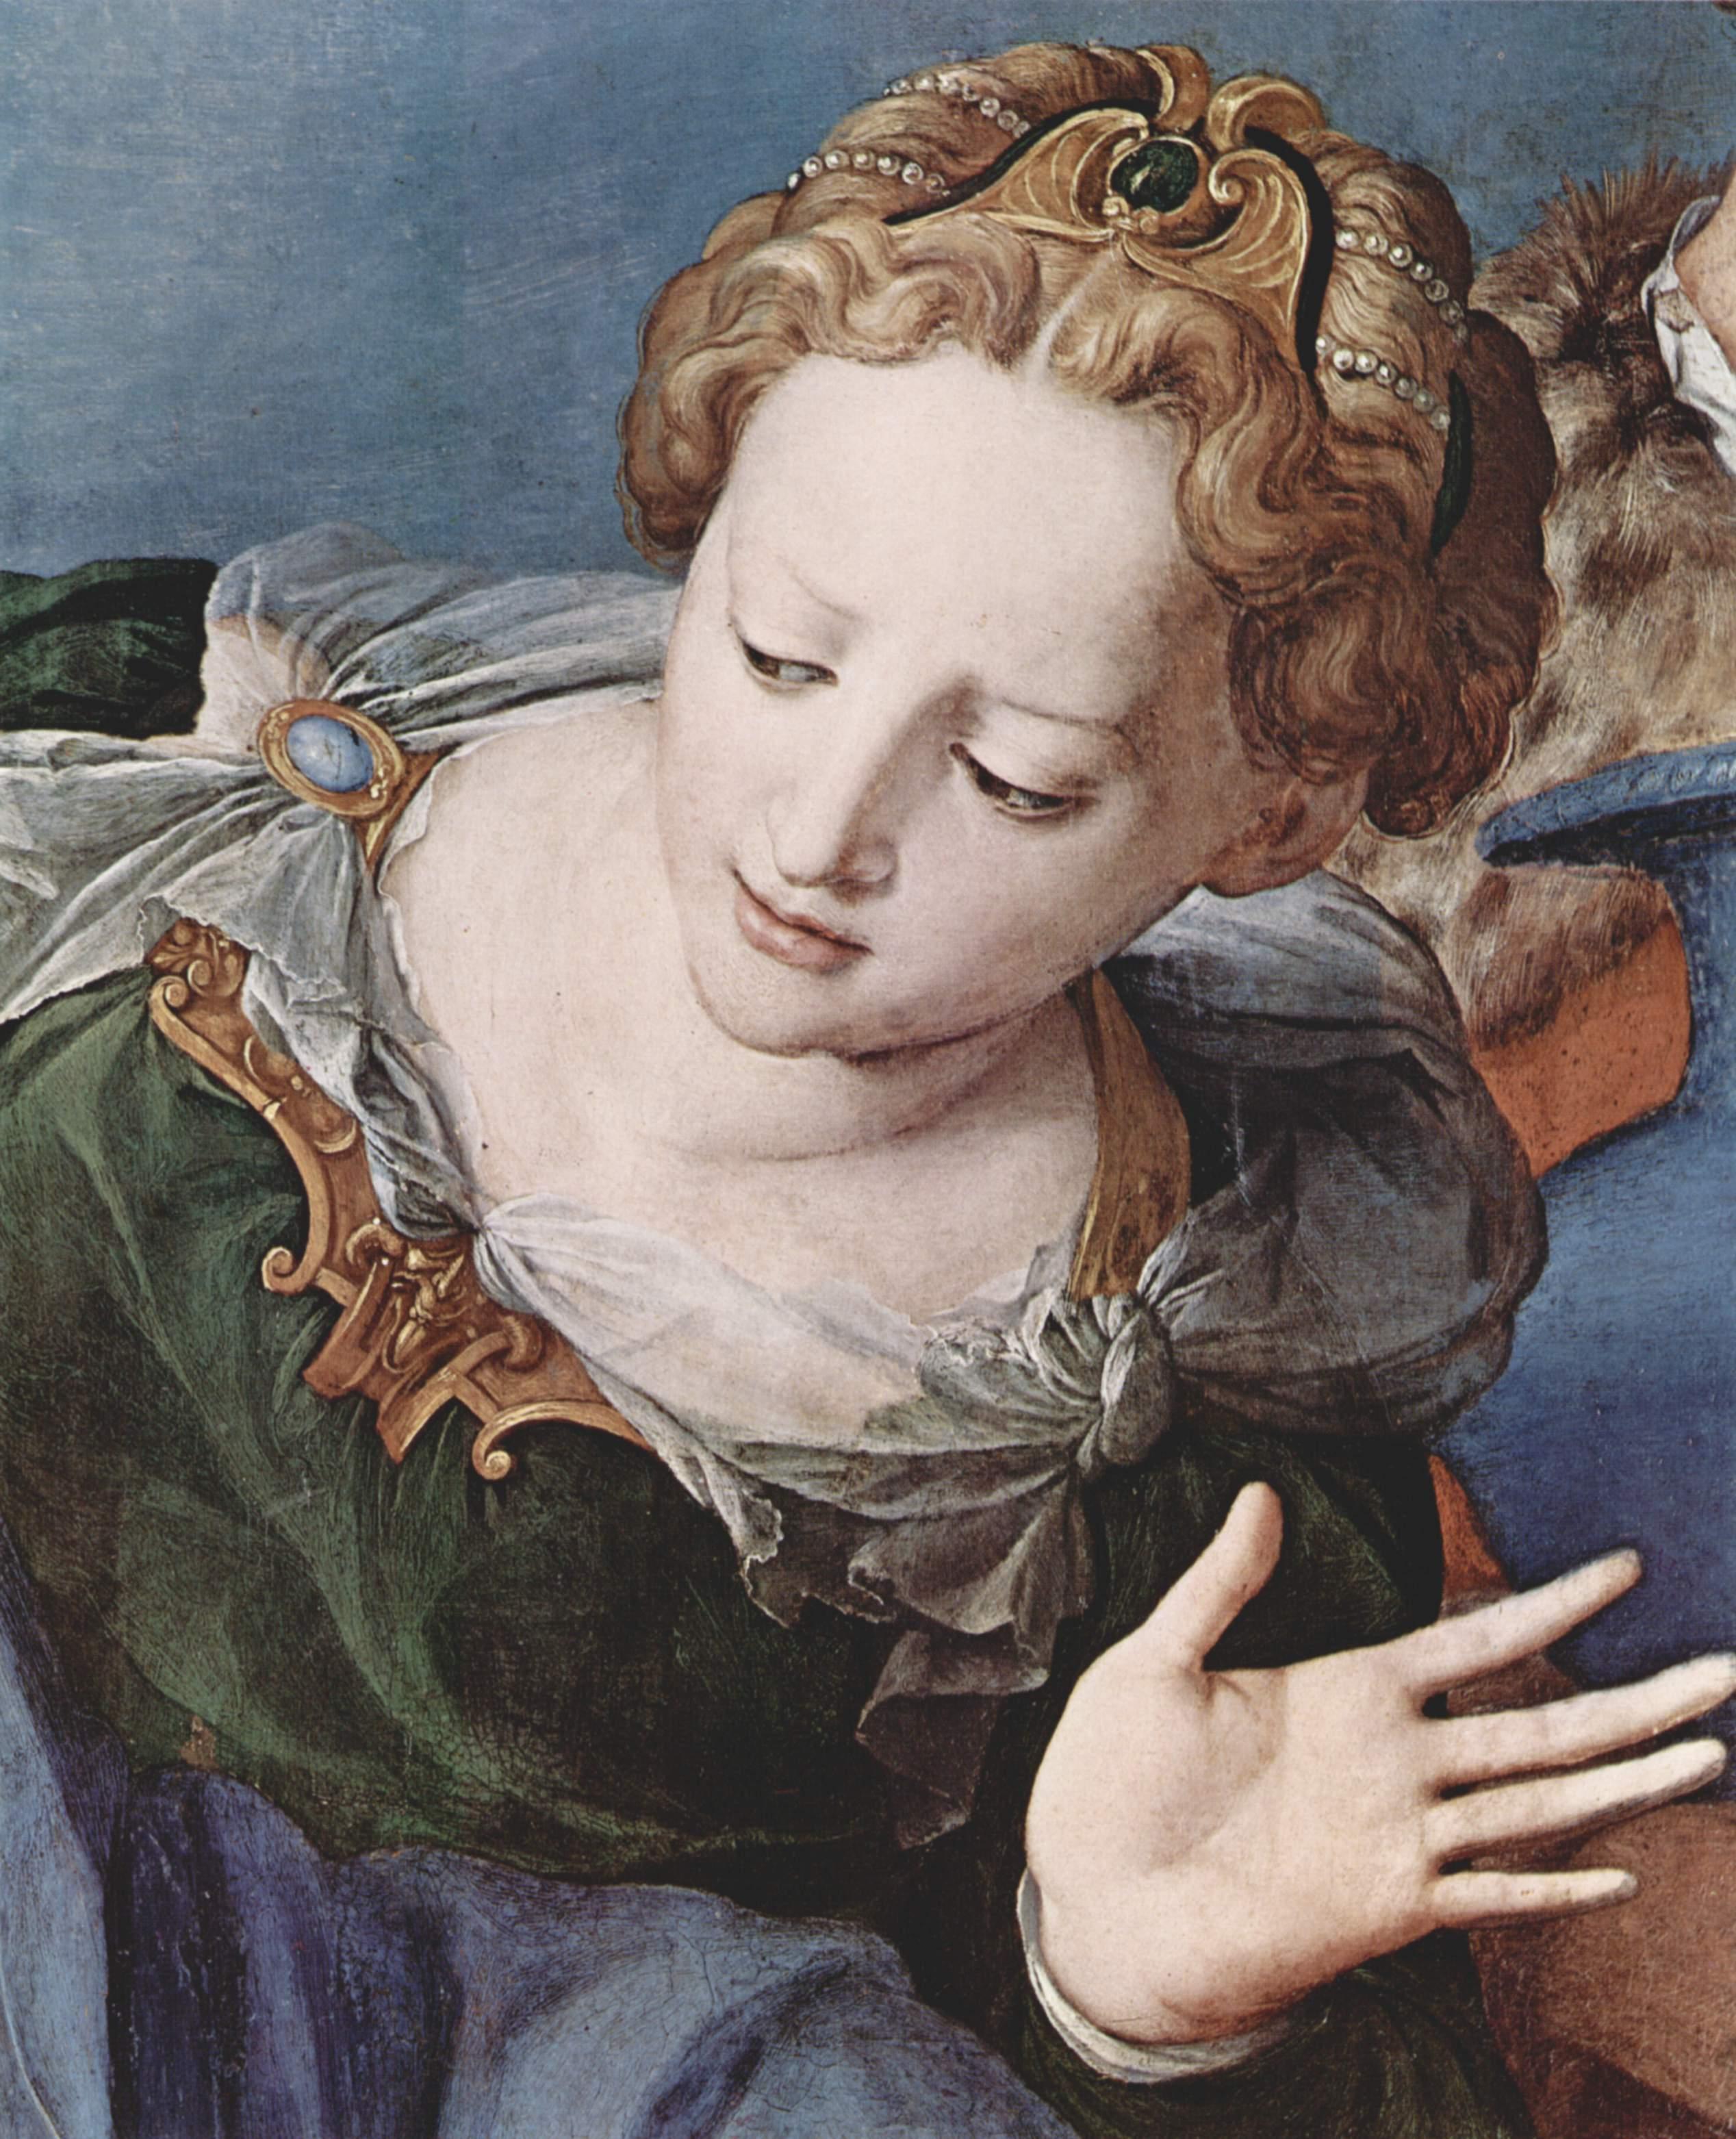 File:Angelo Bronzino 007.jpg - Wikimedia Commons | 2536 x 3124 jpeg 634kB